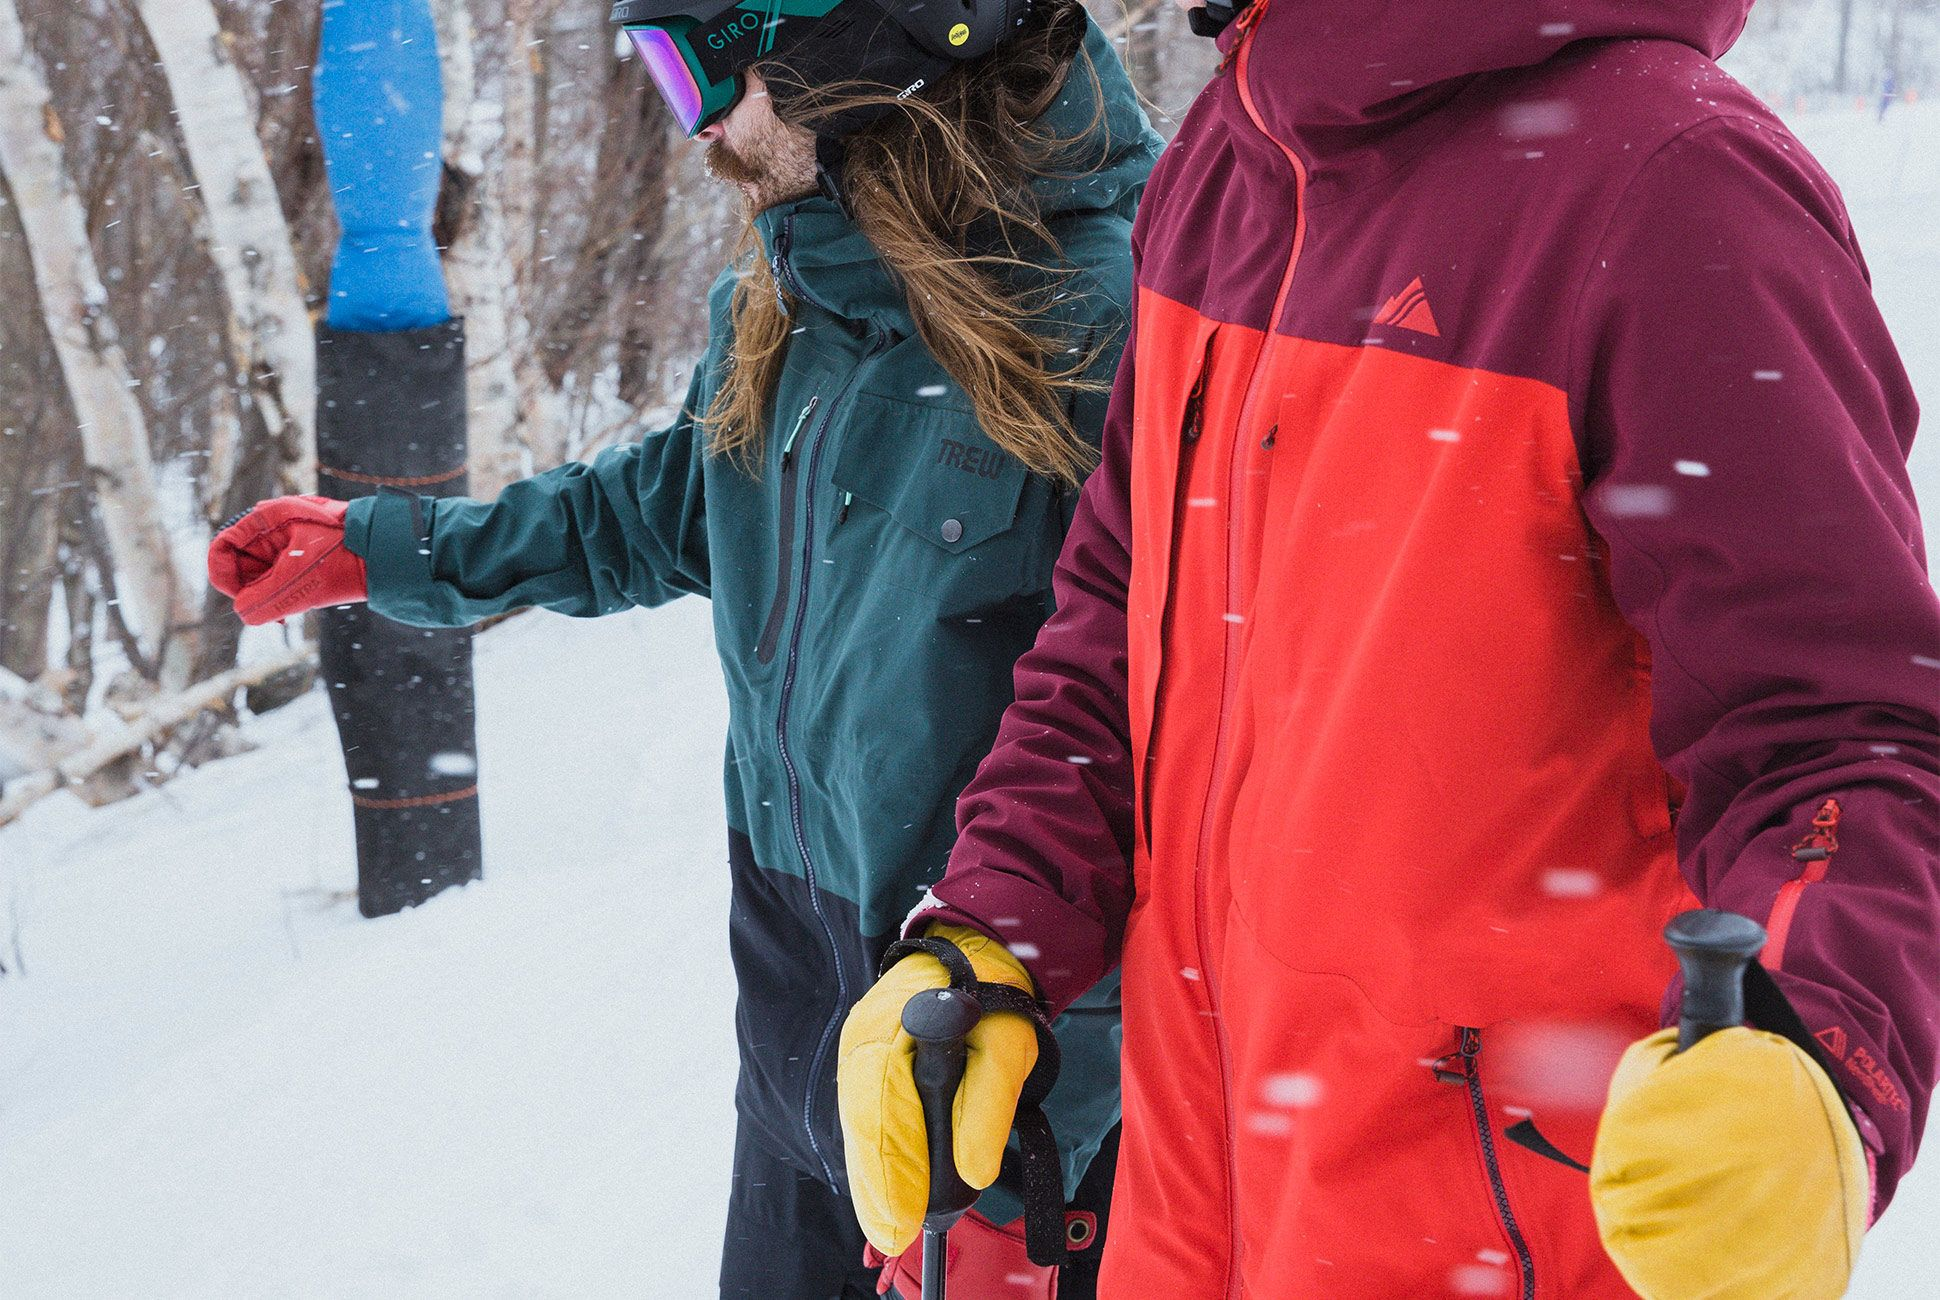 ultimate-ski-and-snow-gear-patrol-strafe-slide-2